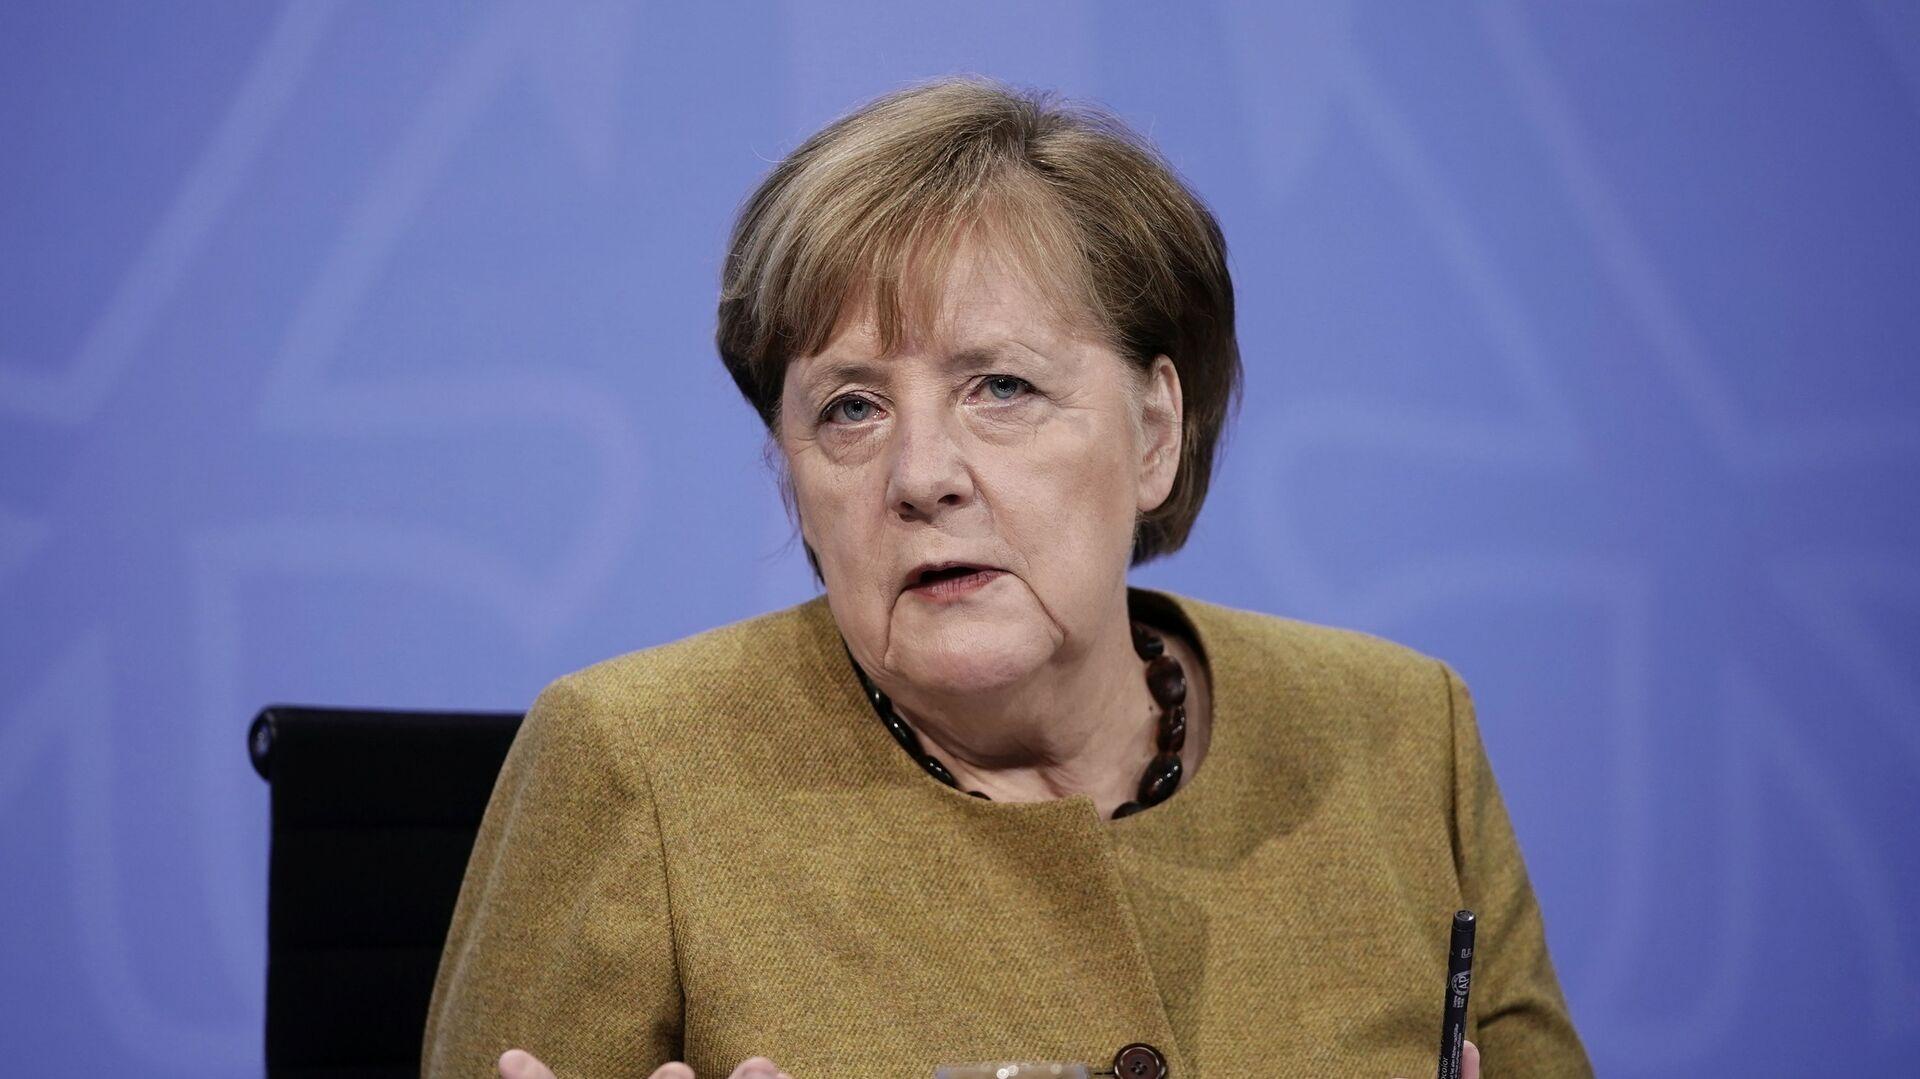 Angela Merkel, canciller alemana - Sputnik Mundo, 1920, 14.05.2021